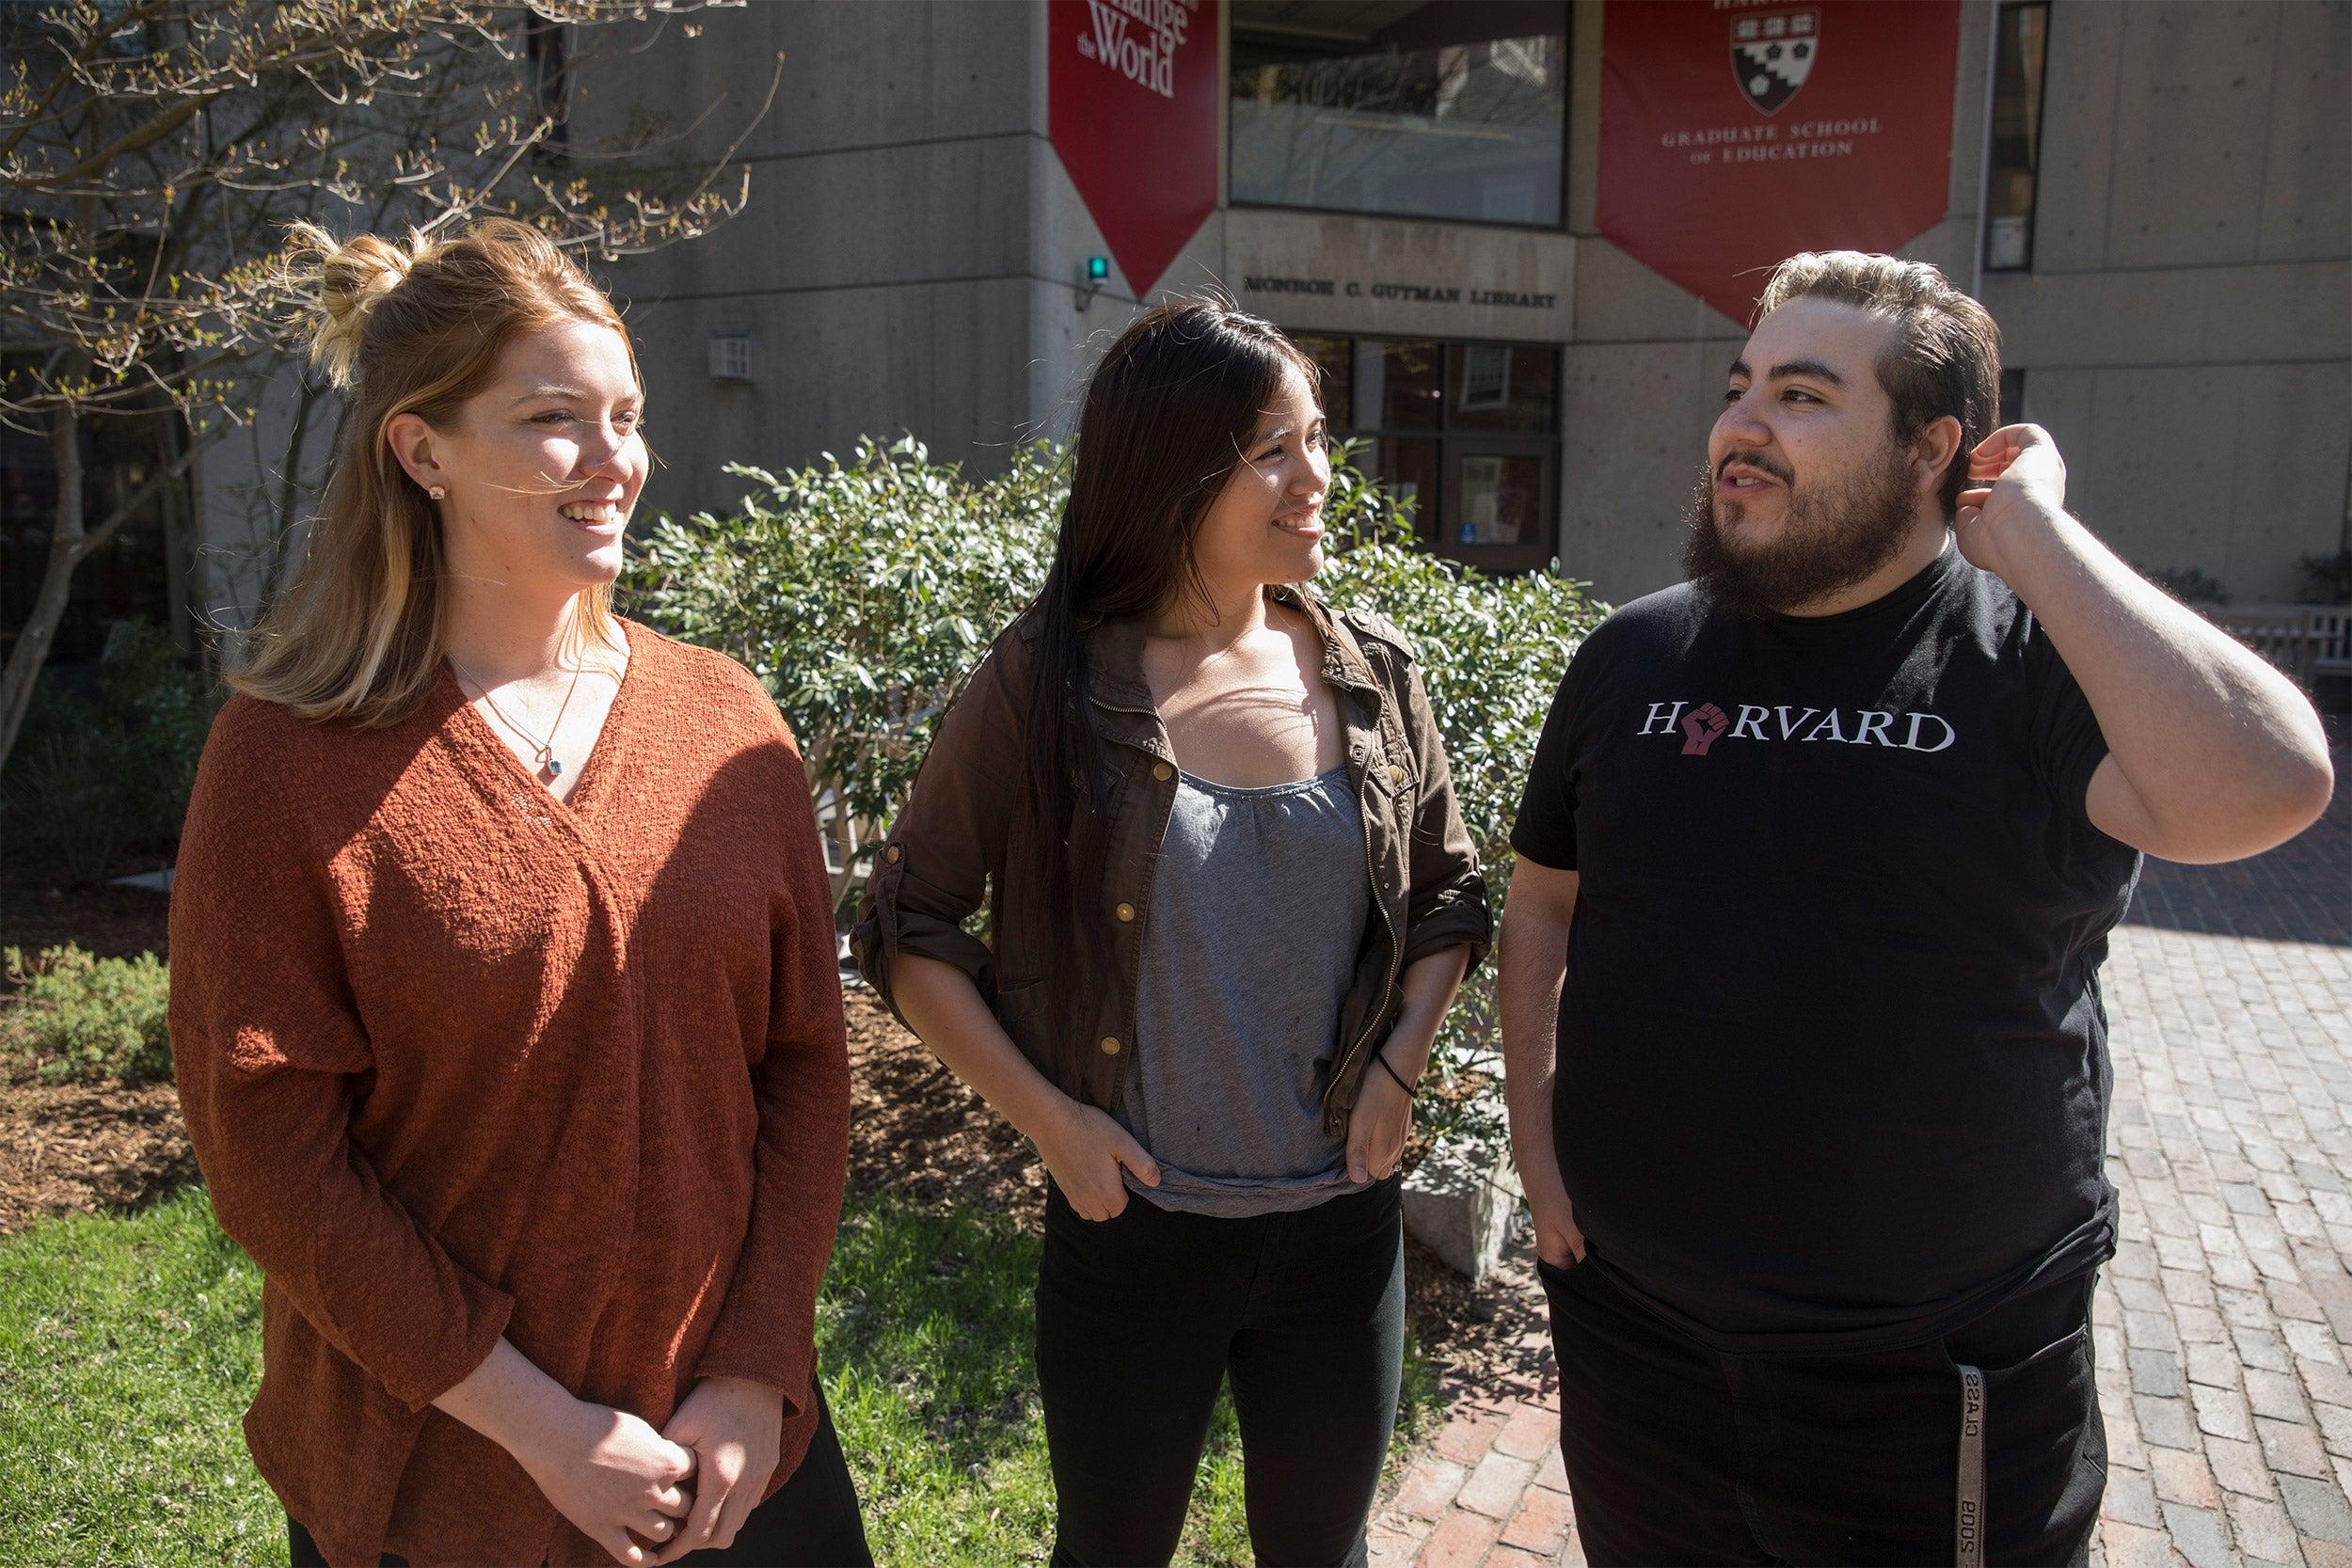 HGSE students, Julia Cunningham, (from left) Morgan Barraza, and Shane Trujillo